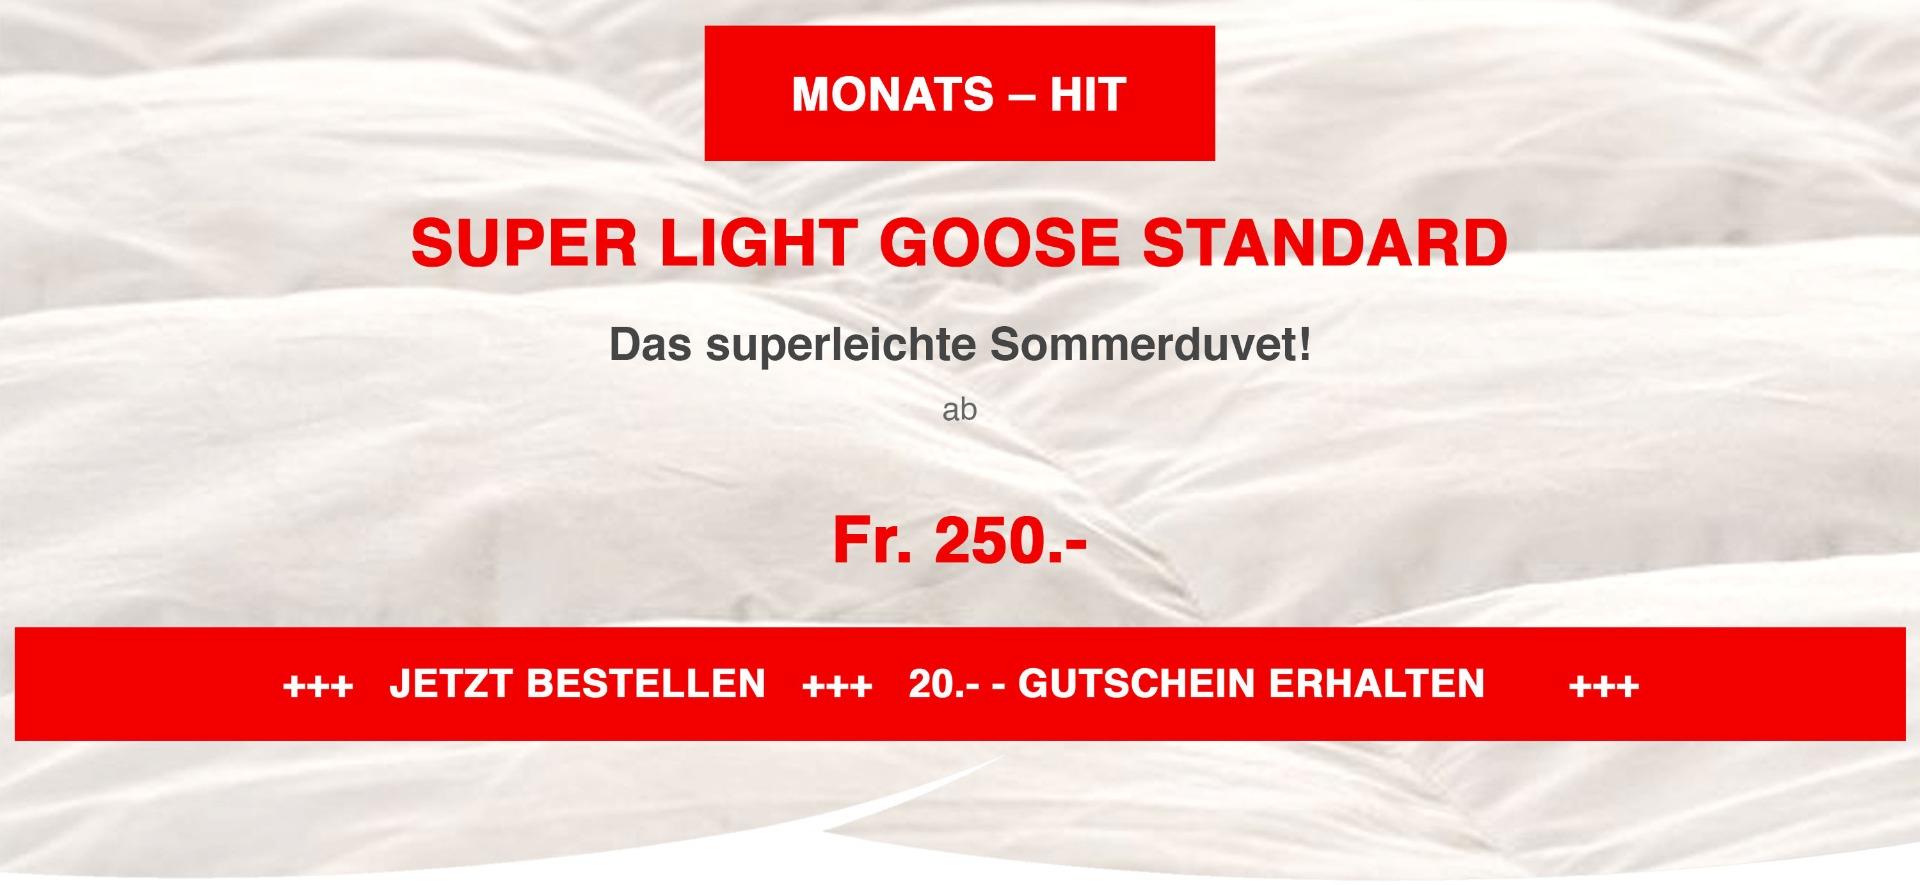 super light goose standard